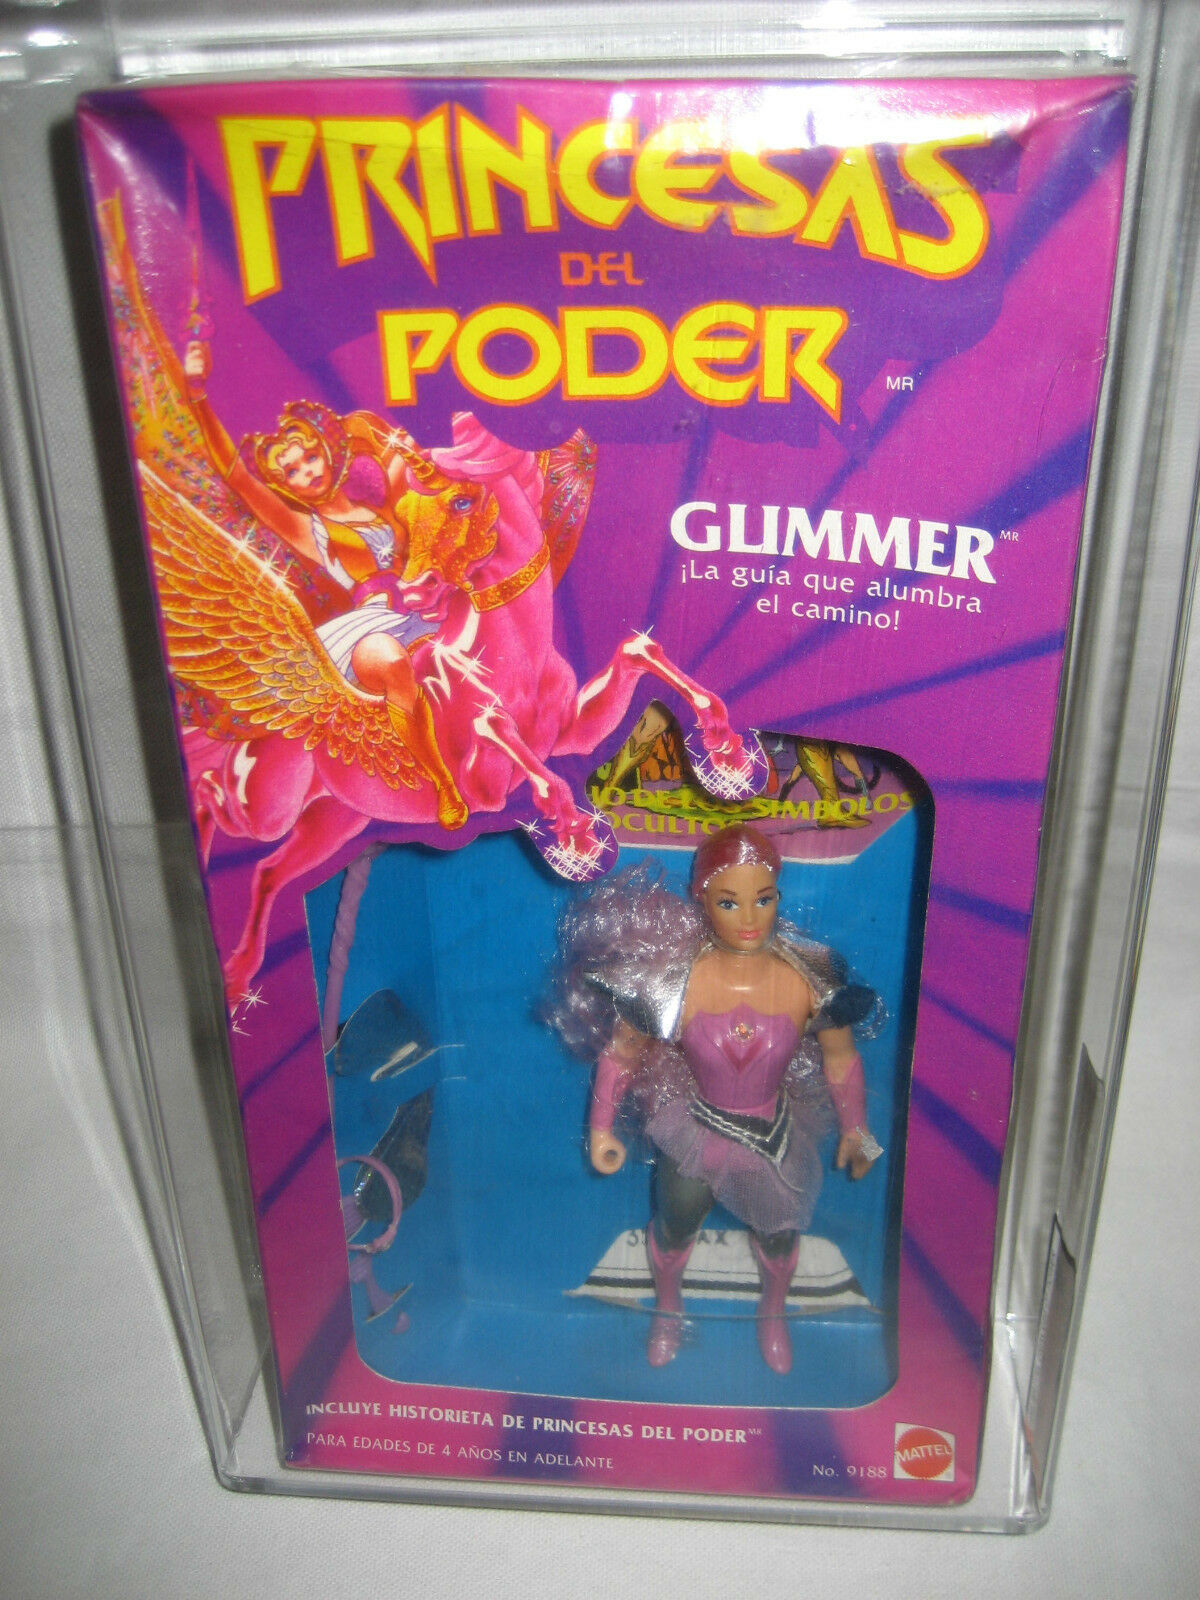 AFA 80 Mattel GLIMMER Princess of Power Mexico MIB PRINCESAS DEL PODER Los Amos